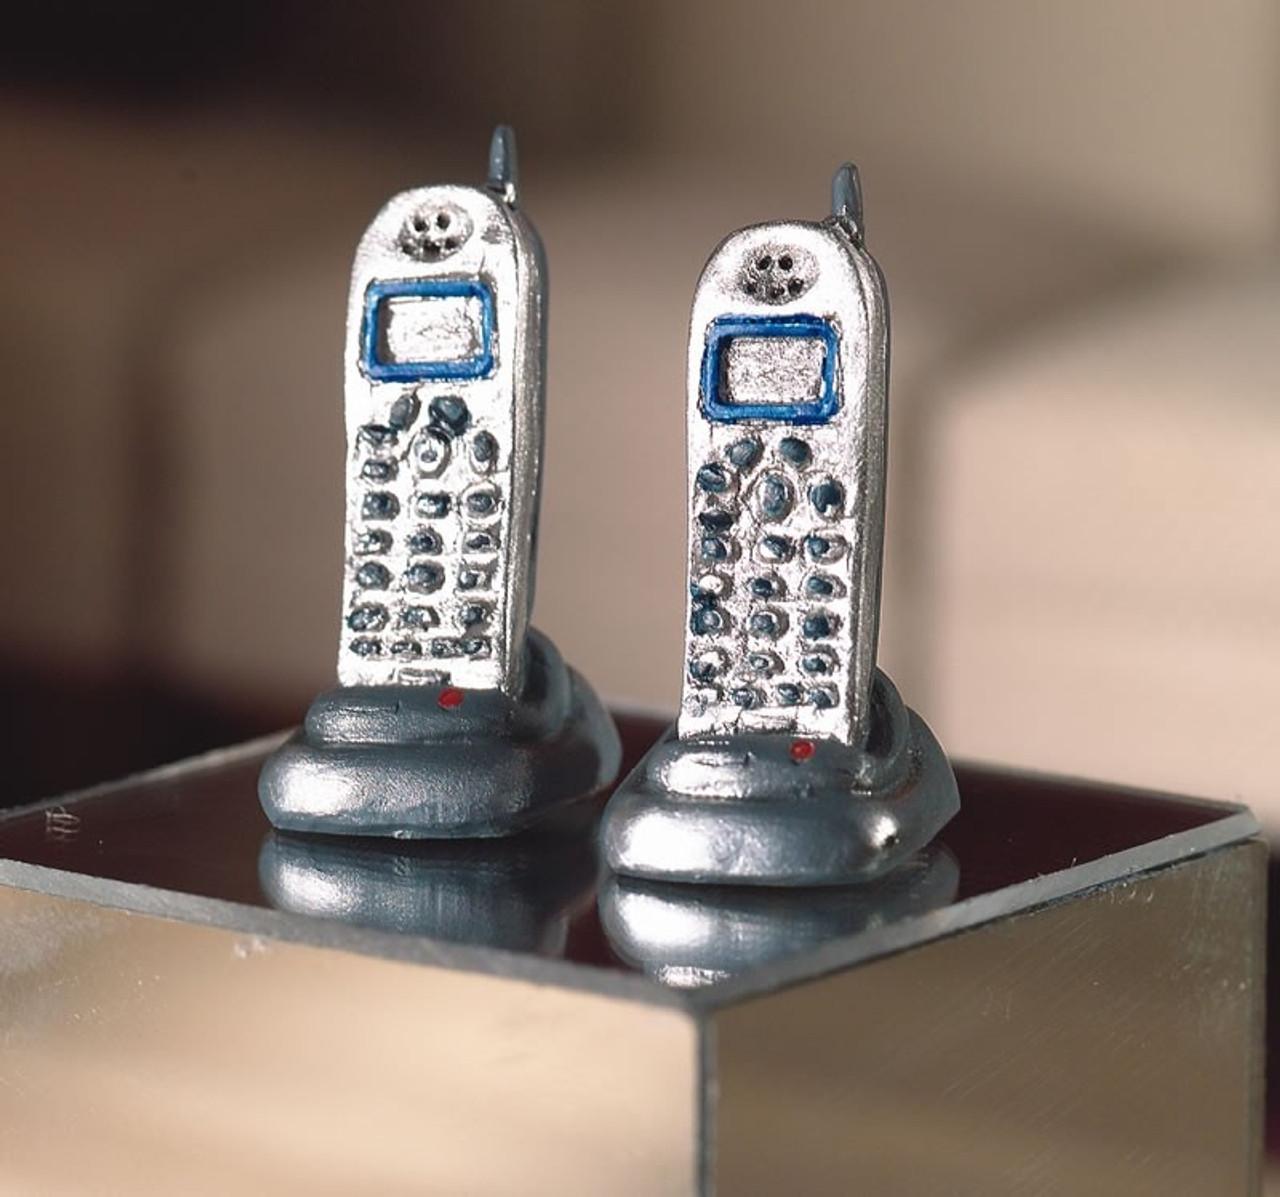 'Cordless' telephones 2pcs 4958